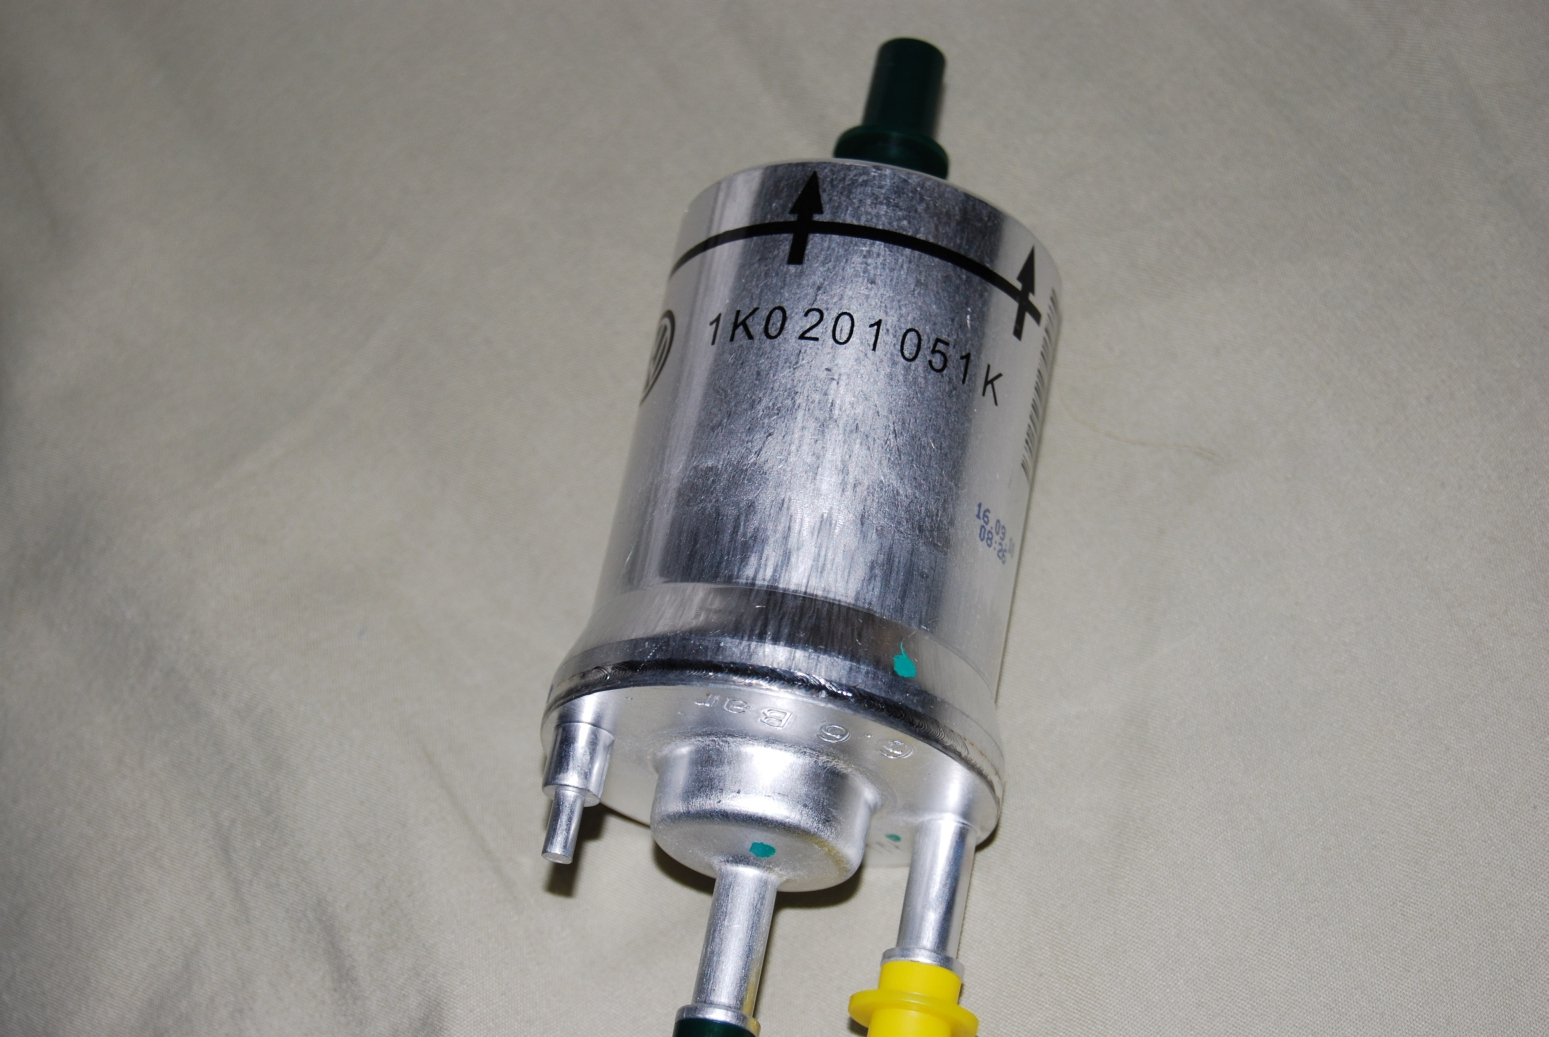 hight resolution of 6 6 bar fuel filter part number 1k0 201 051 k